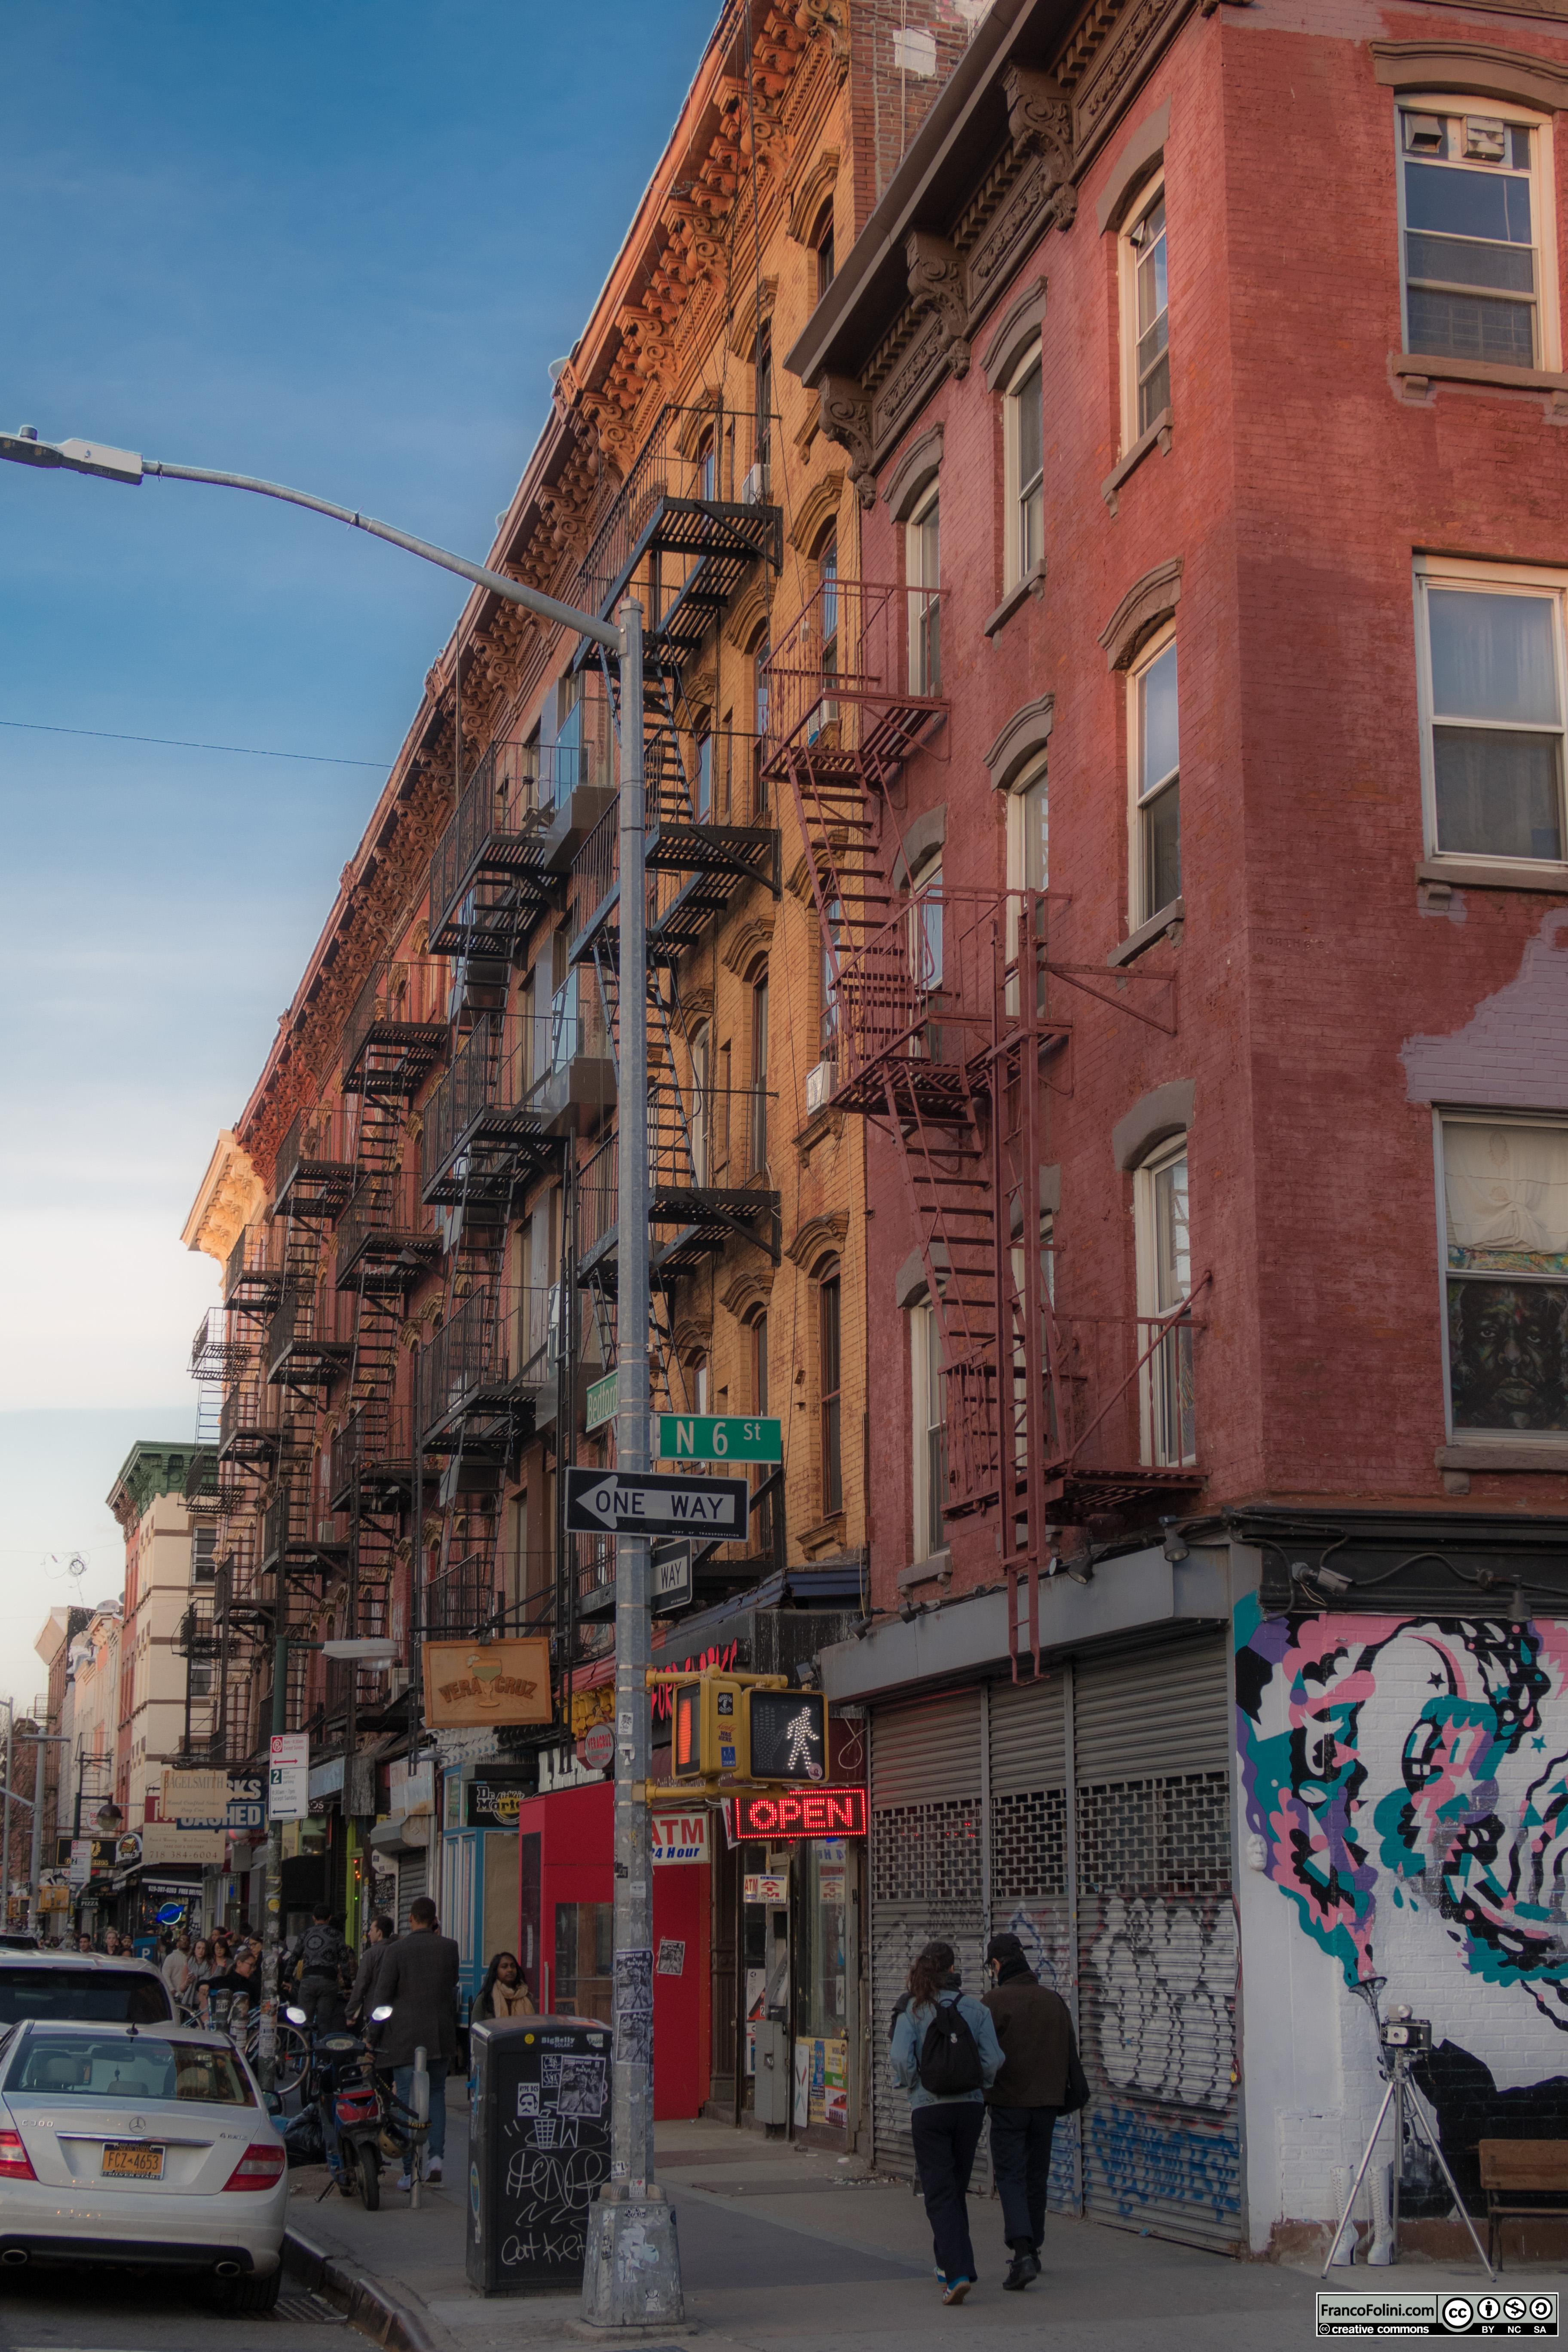 Bedford Ave at N 6st Street, Brooklyn